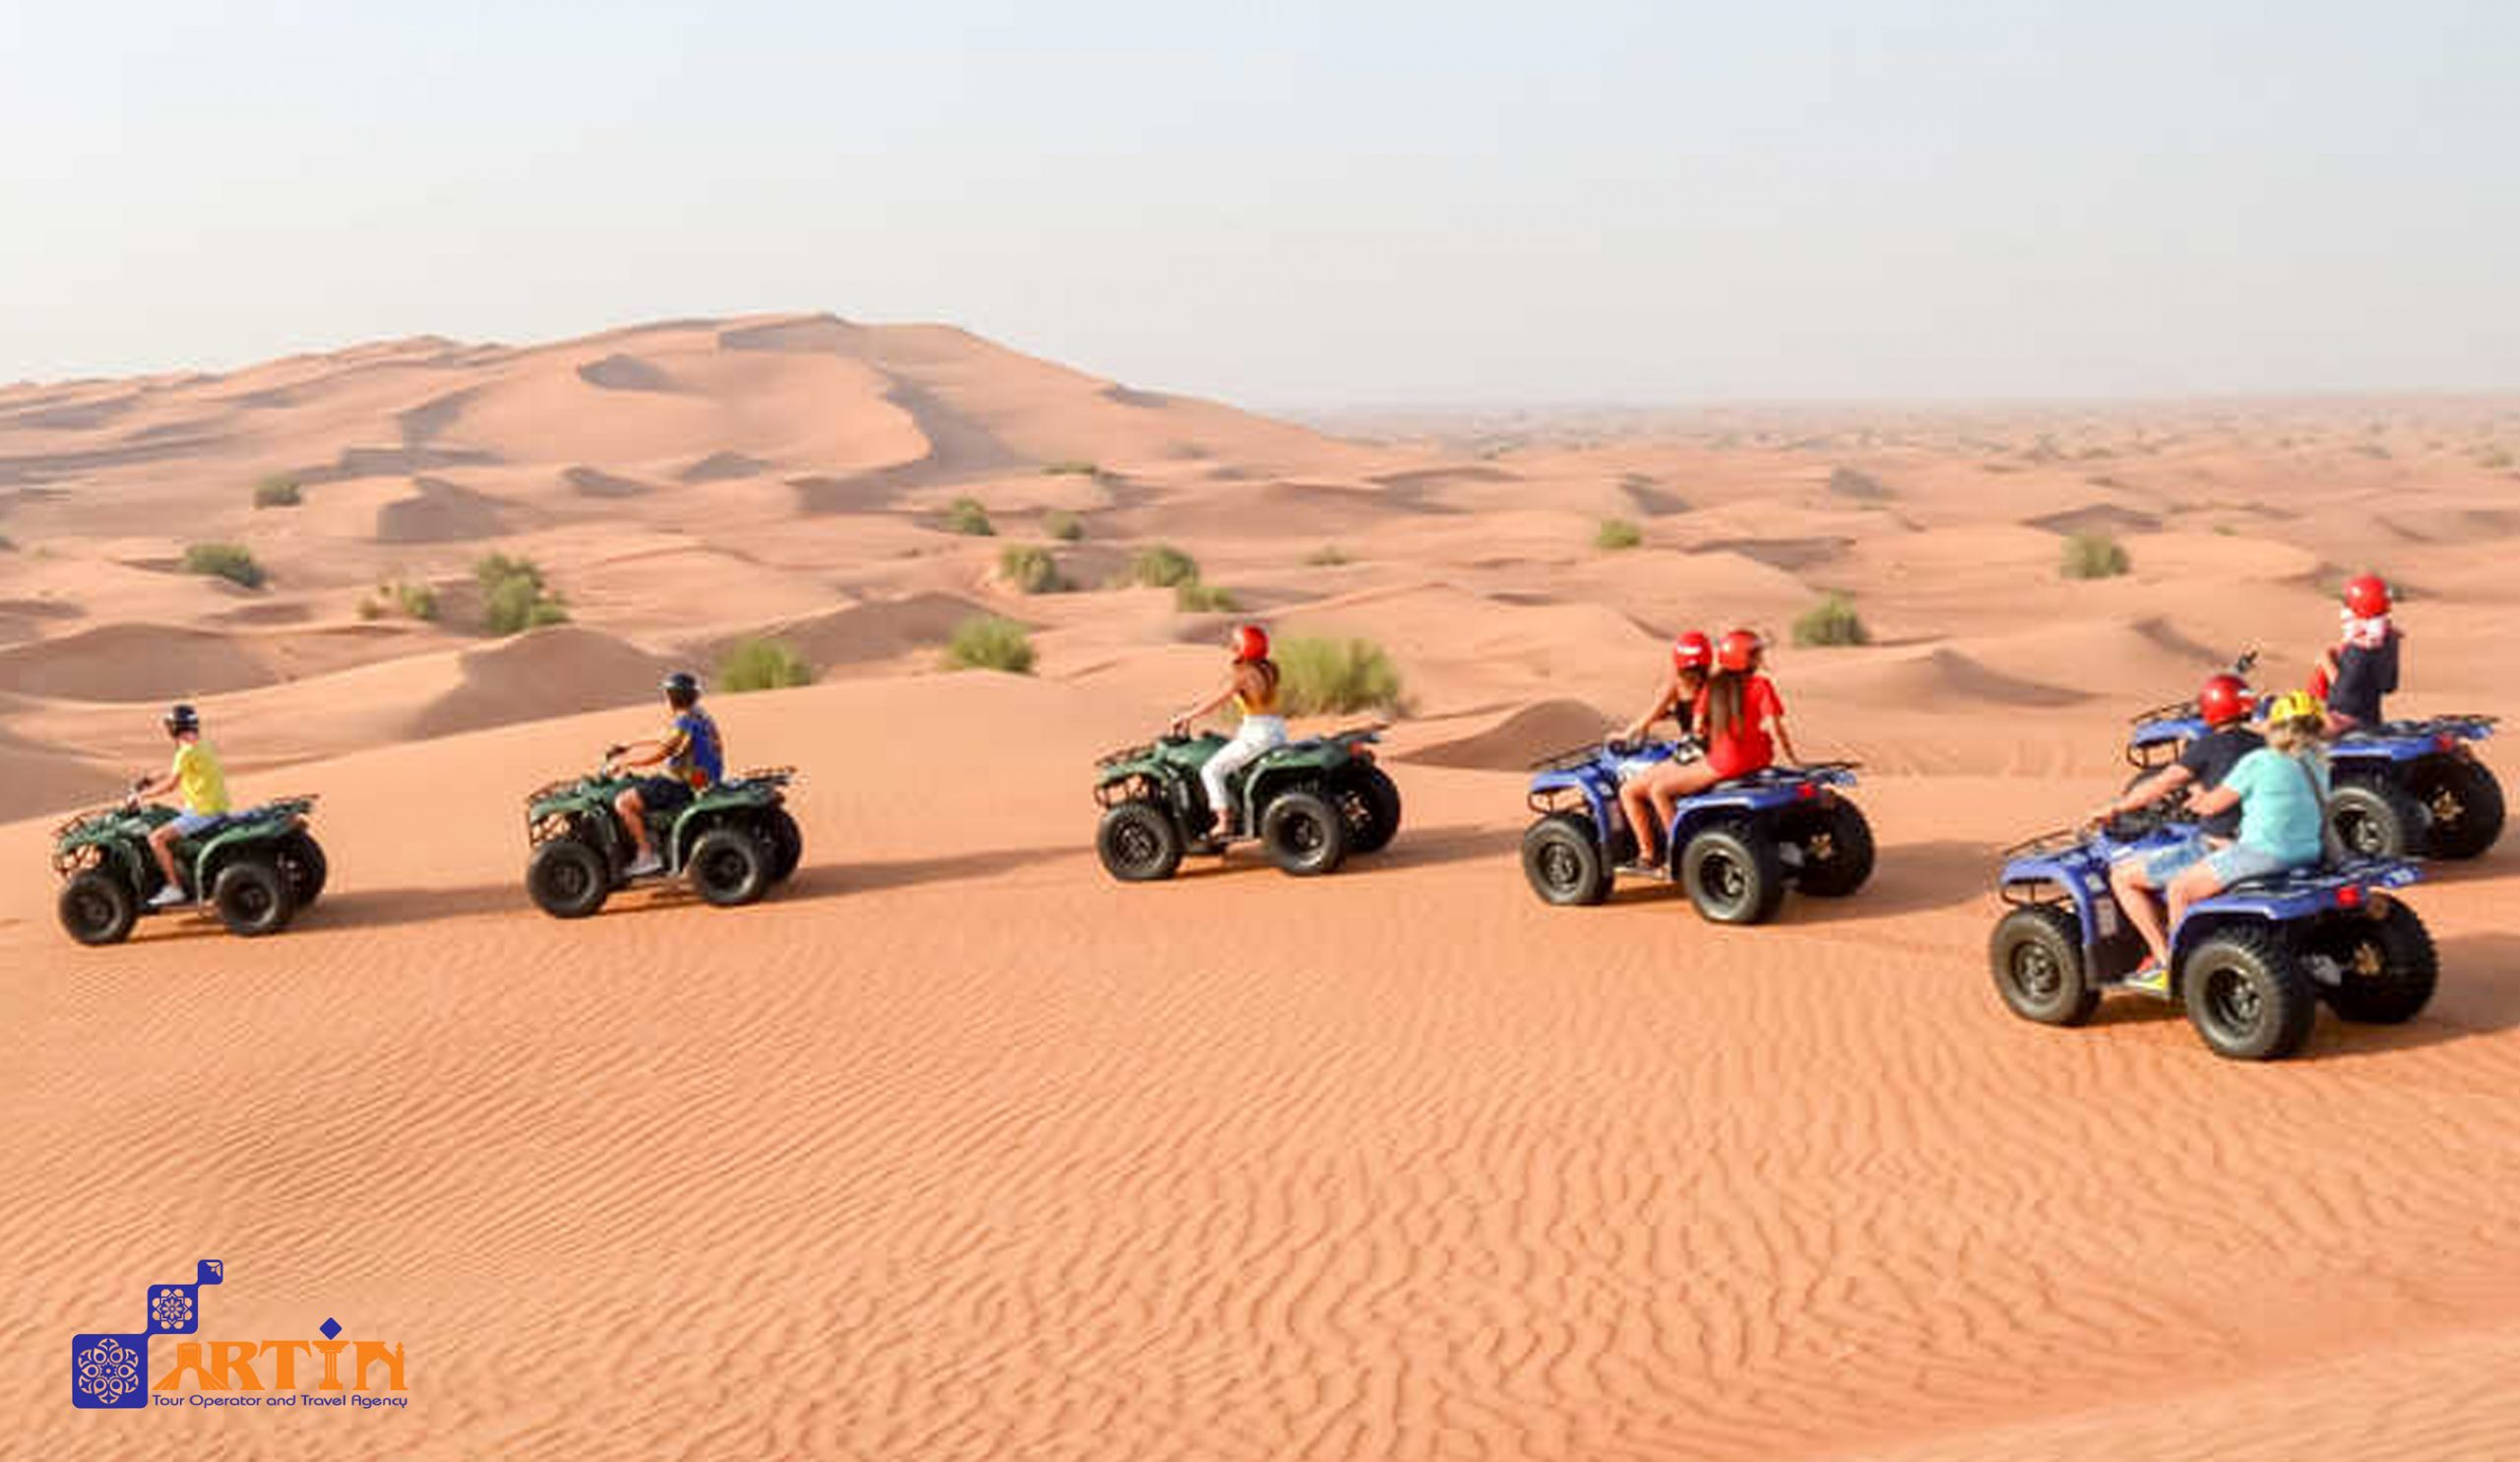 Best-Iran-desert-tours-travelartin4